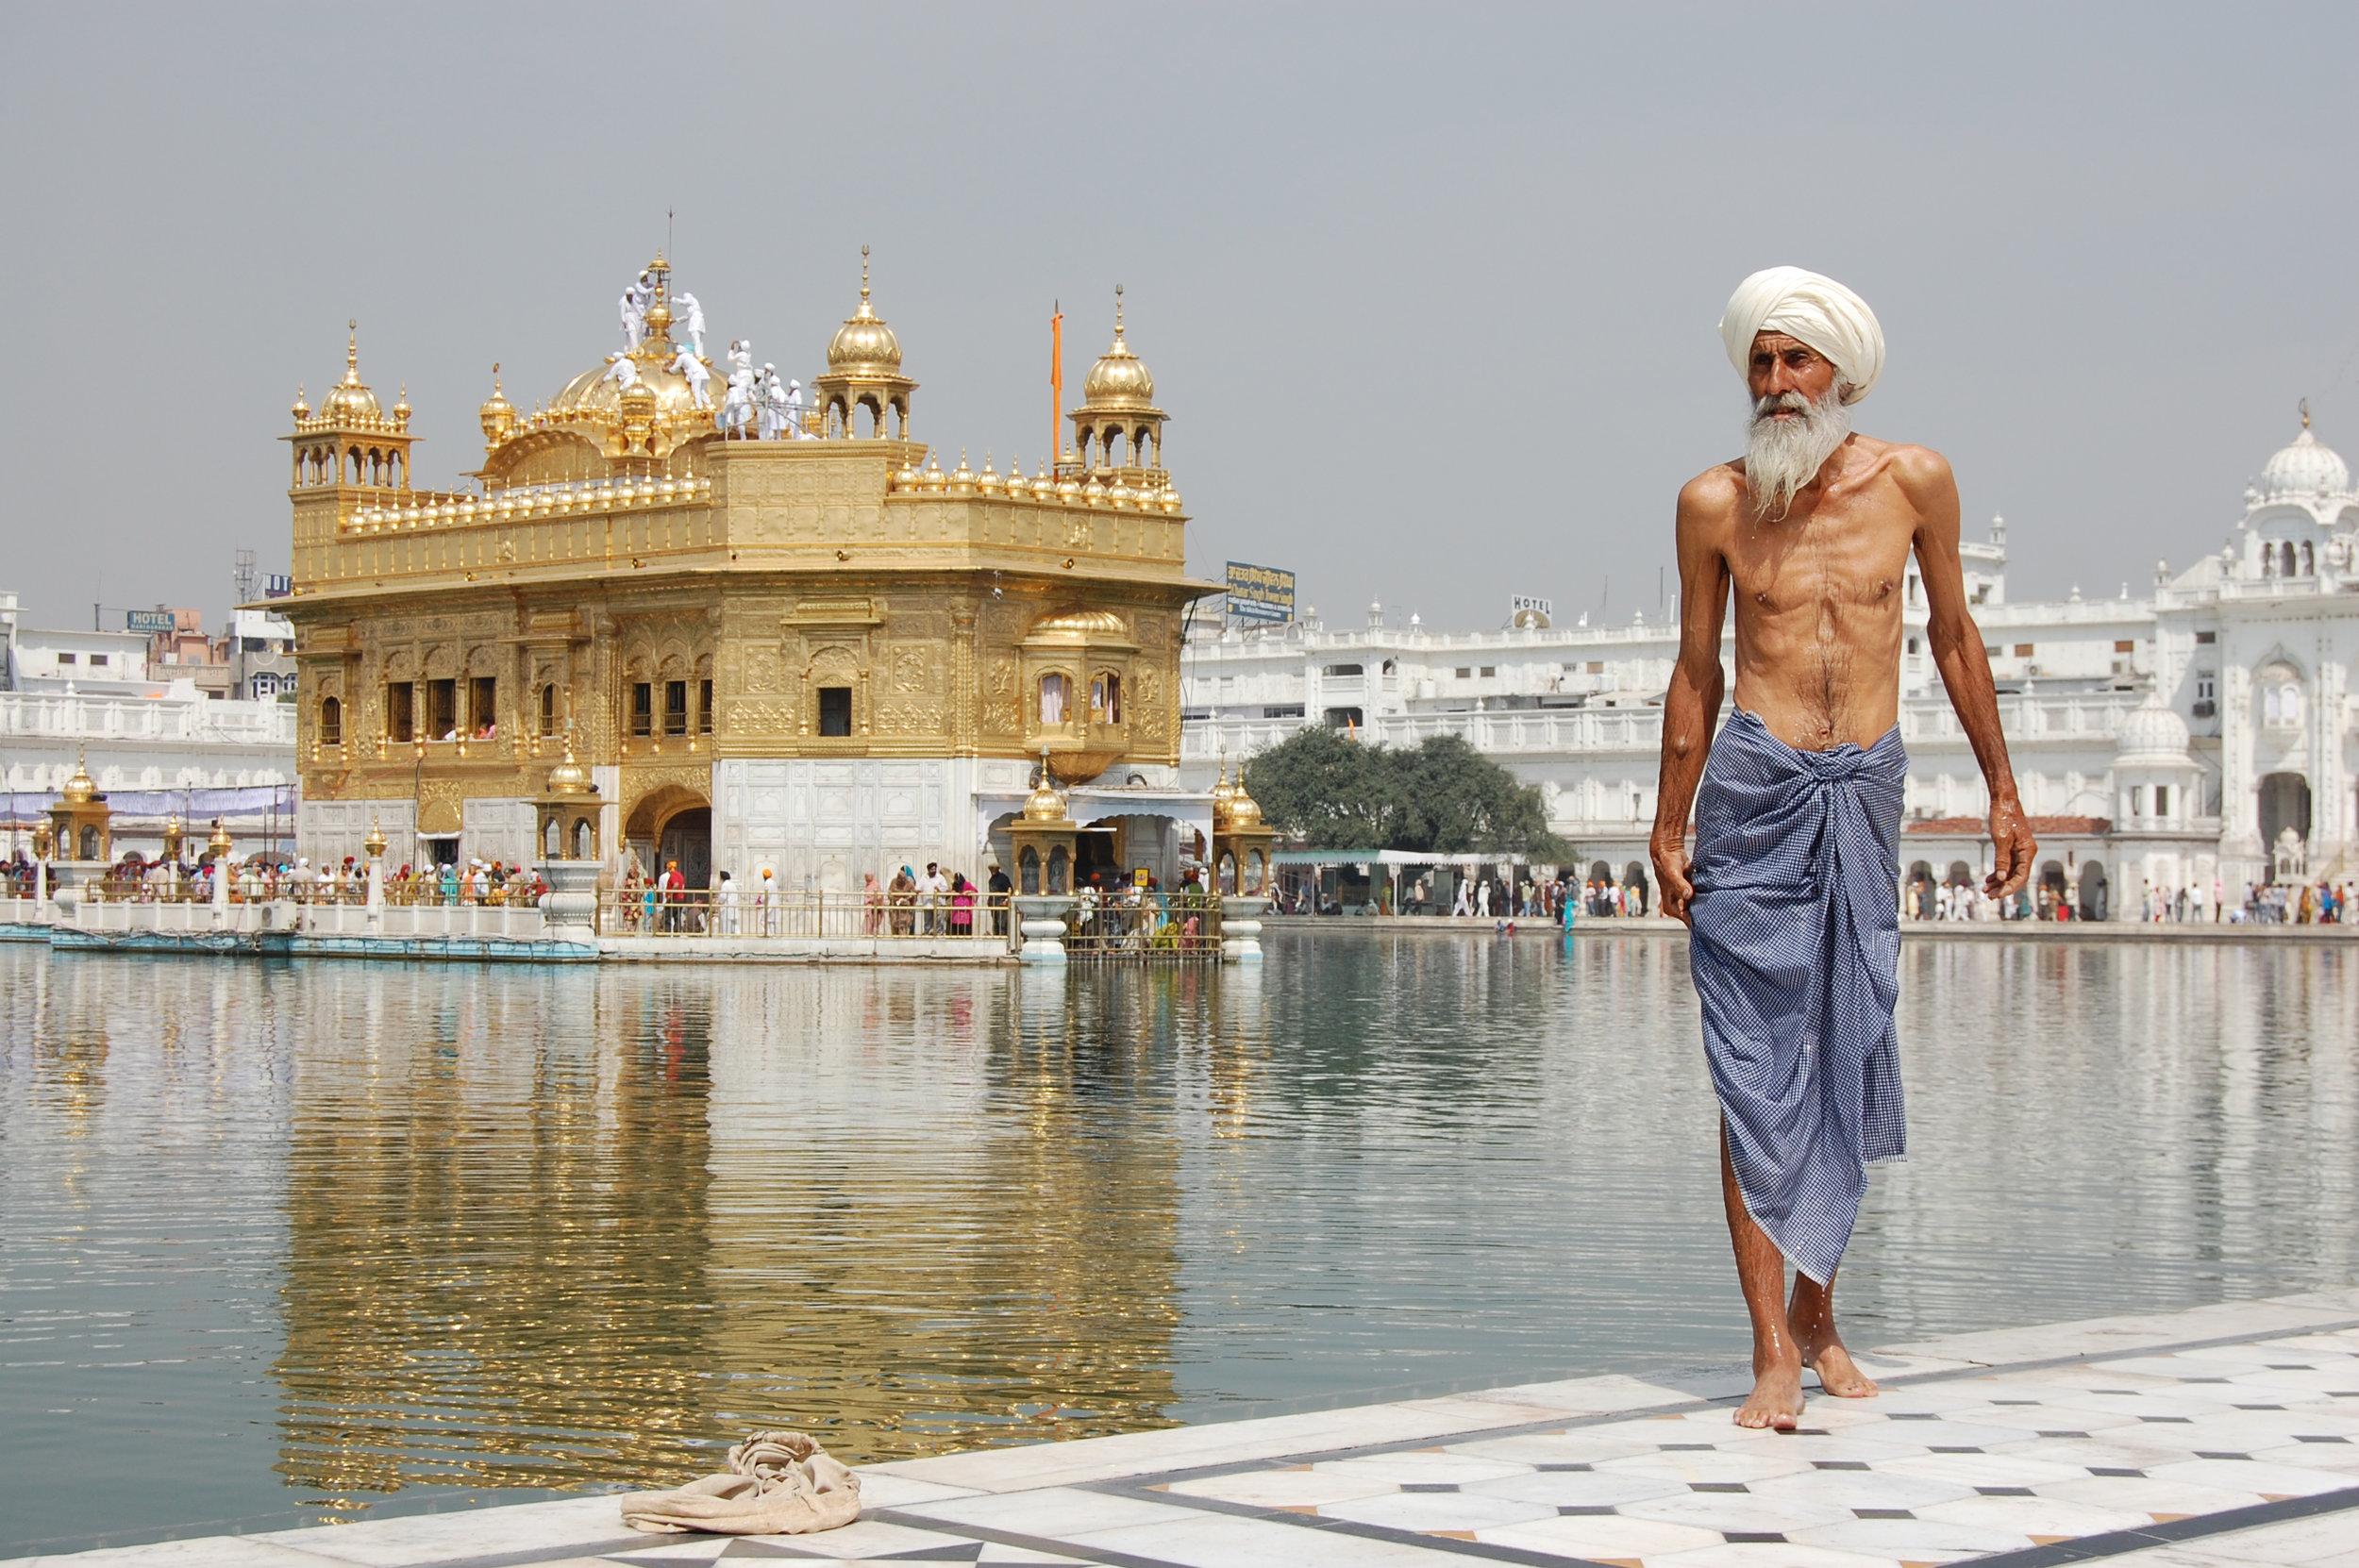 Sikh_pilgrim_at_the_Golden_Temple_(Harmandir_Sahib)_in_Amritsar,_India.jpg